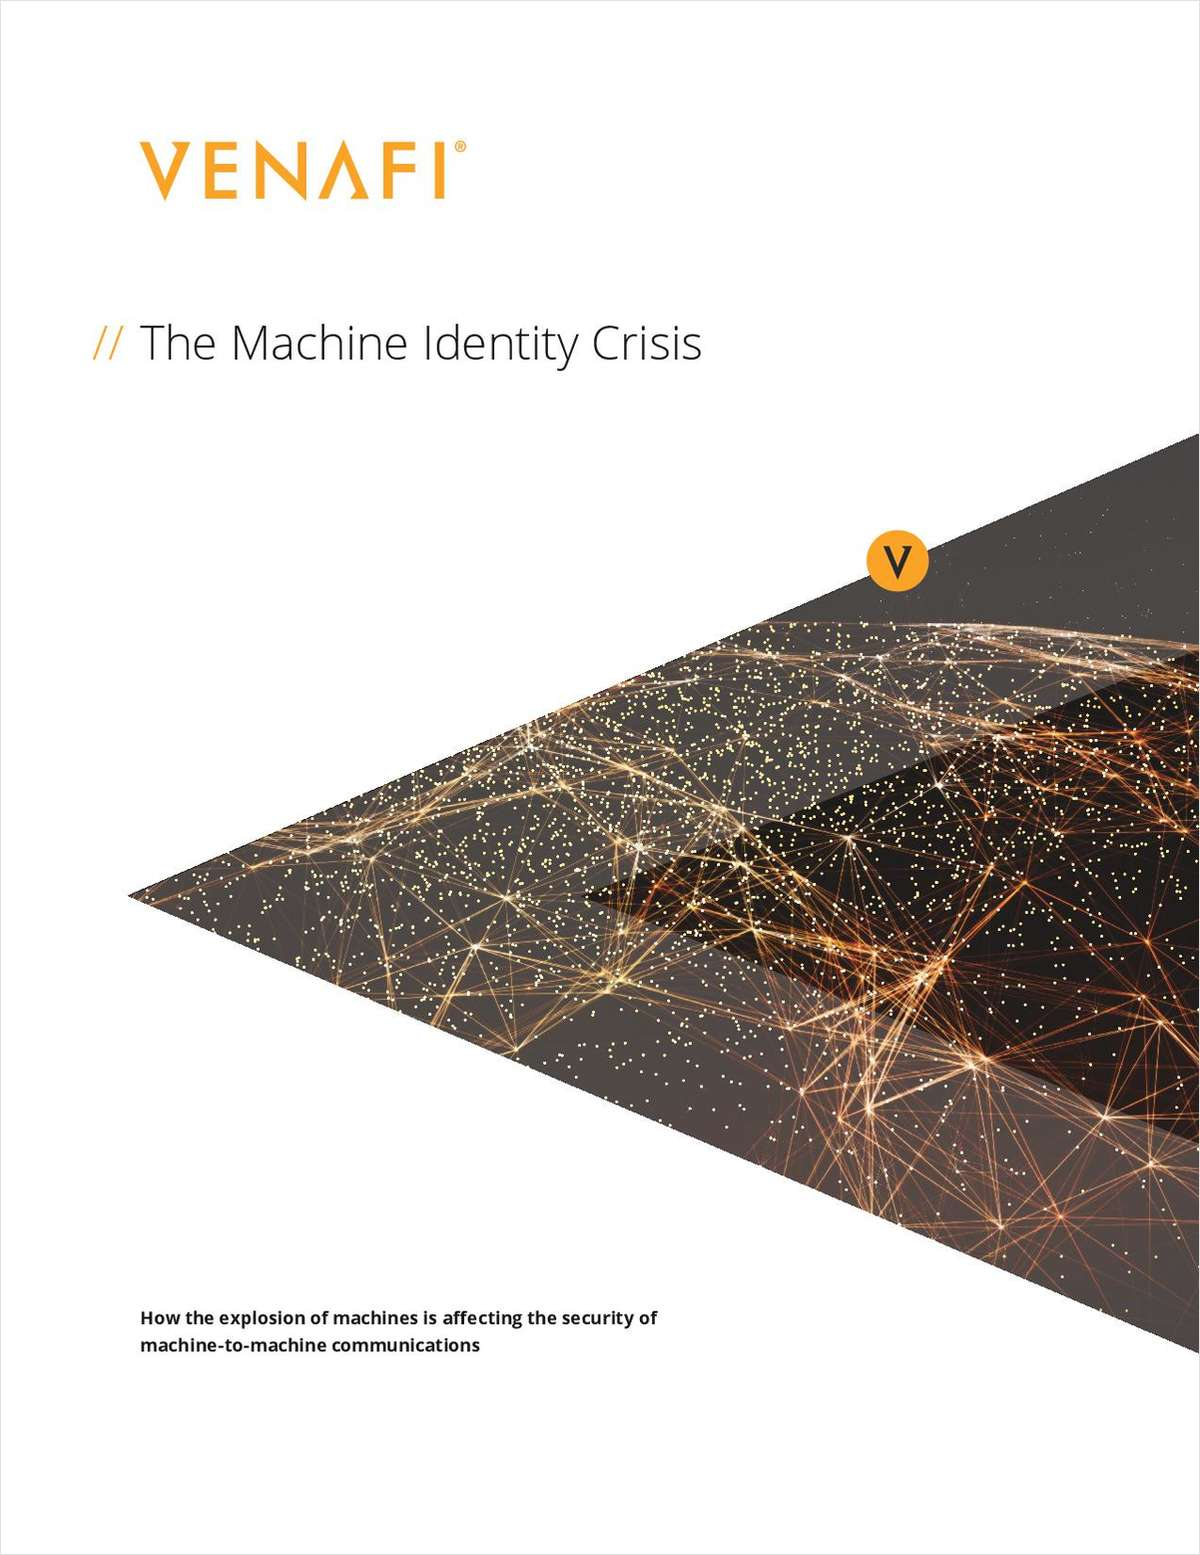 The Machine Identity Crisis